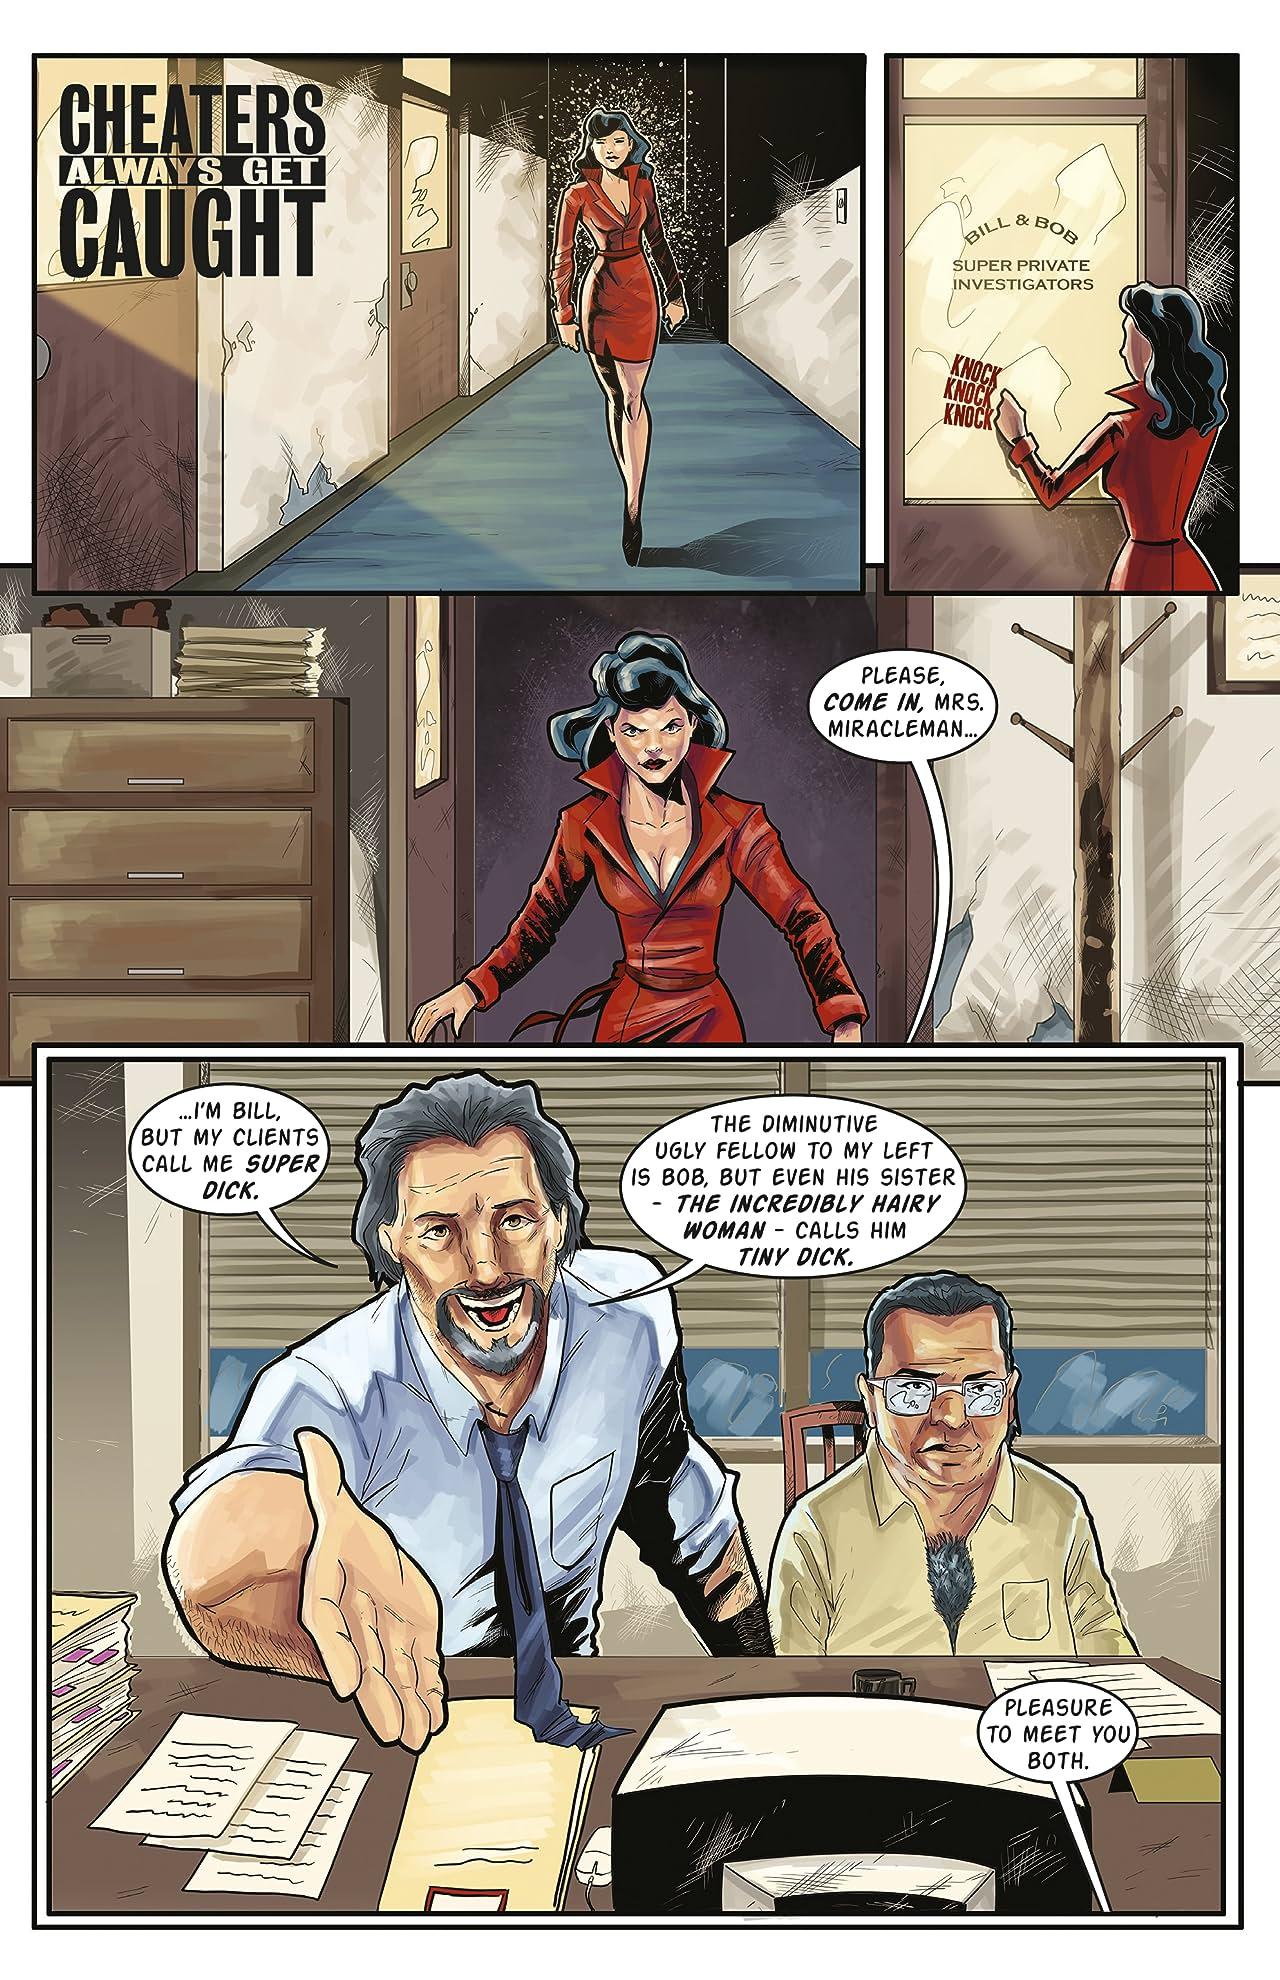 Super Dick #1